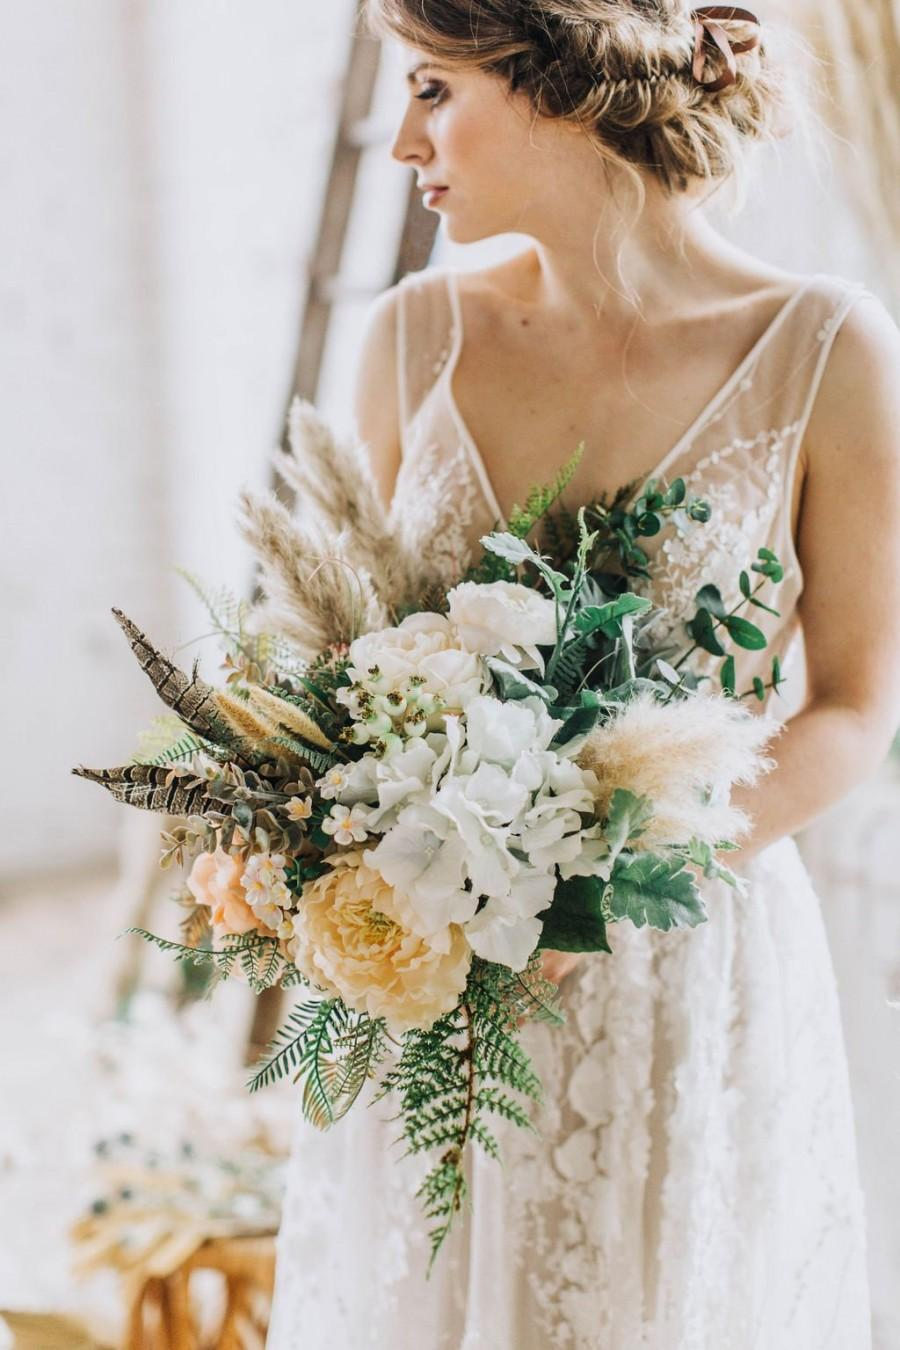 Hochzeit - Freeform bouquet, peach bouquet, peach wedding flower, wildflower bouquet, boho bouquet, boho wedding, silk bouquet, artificial bouquet